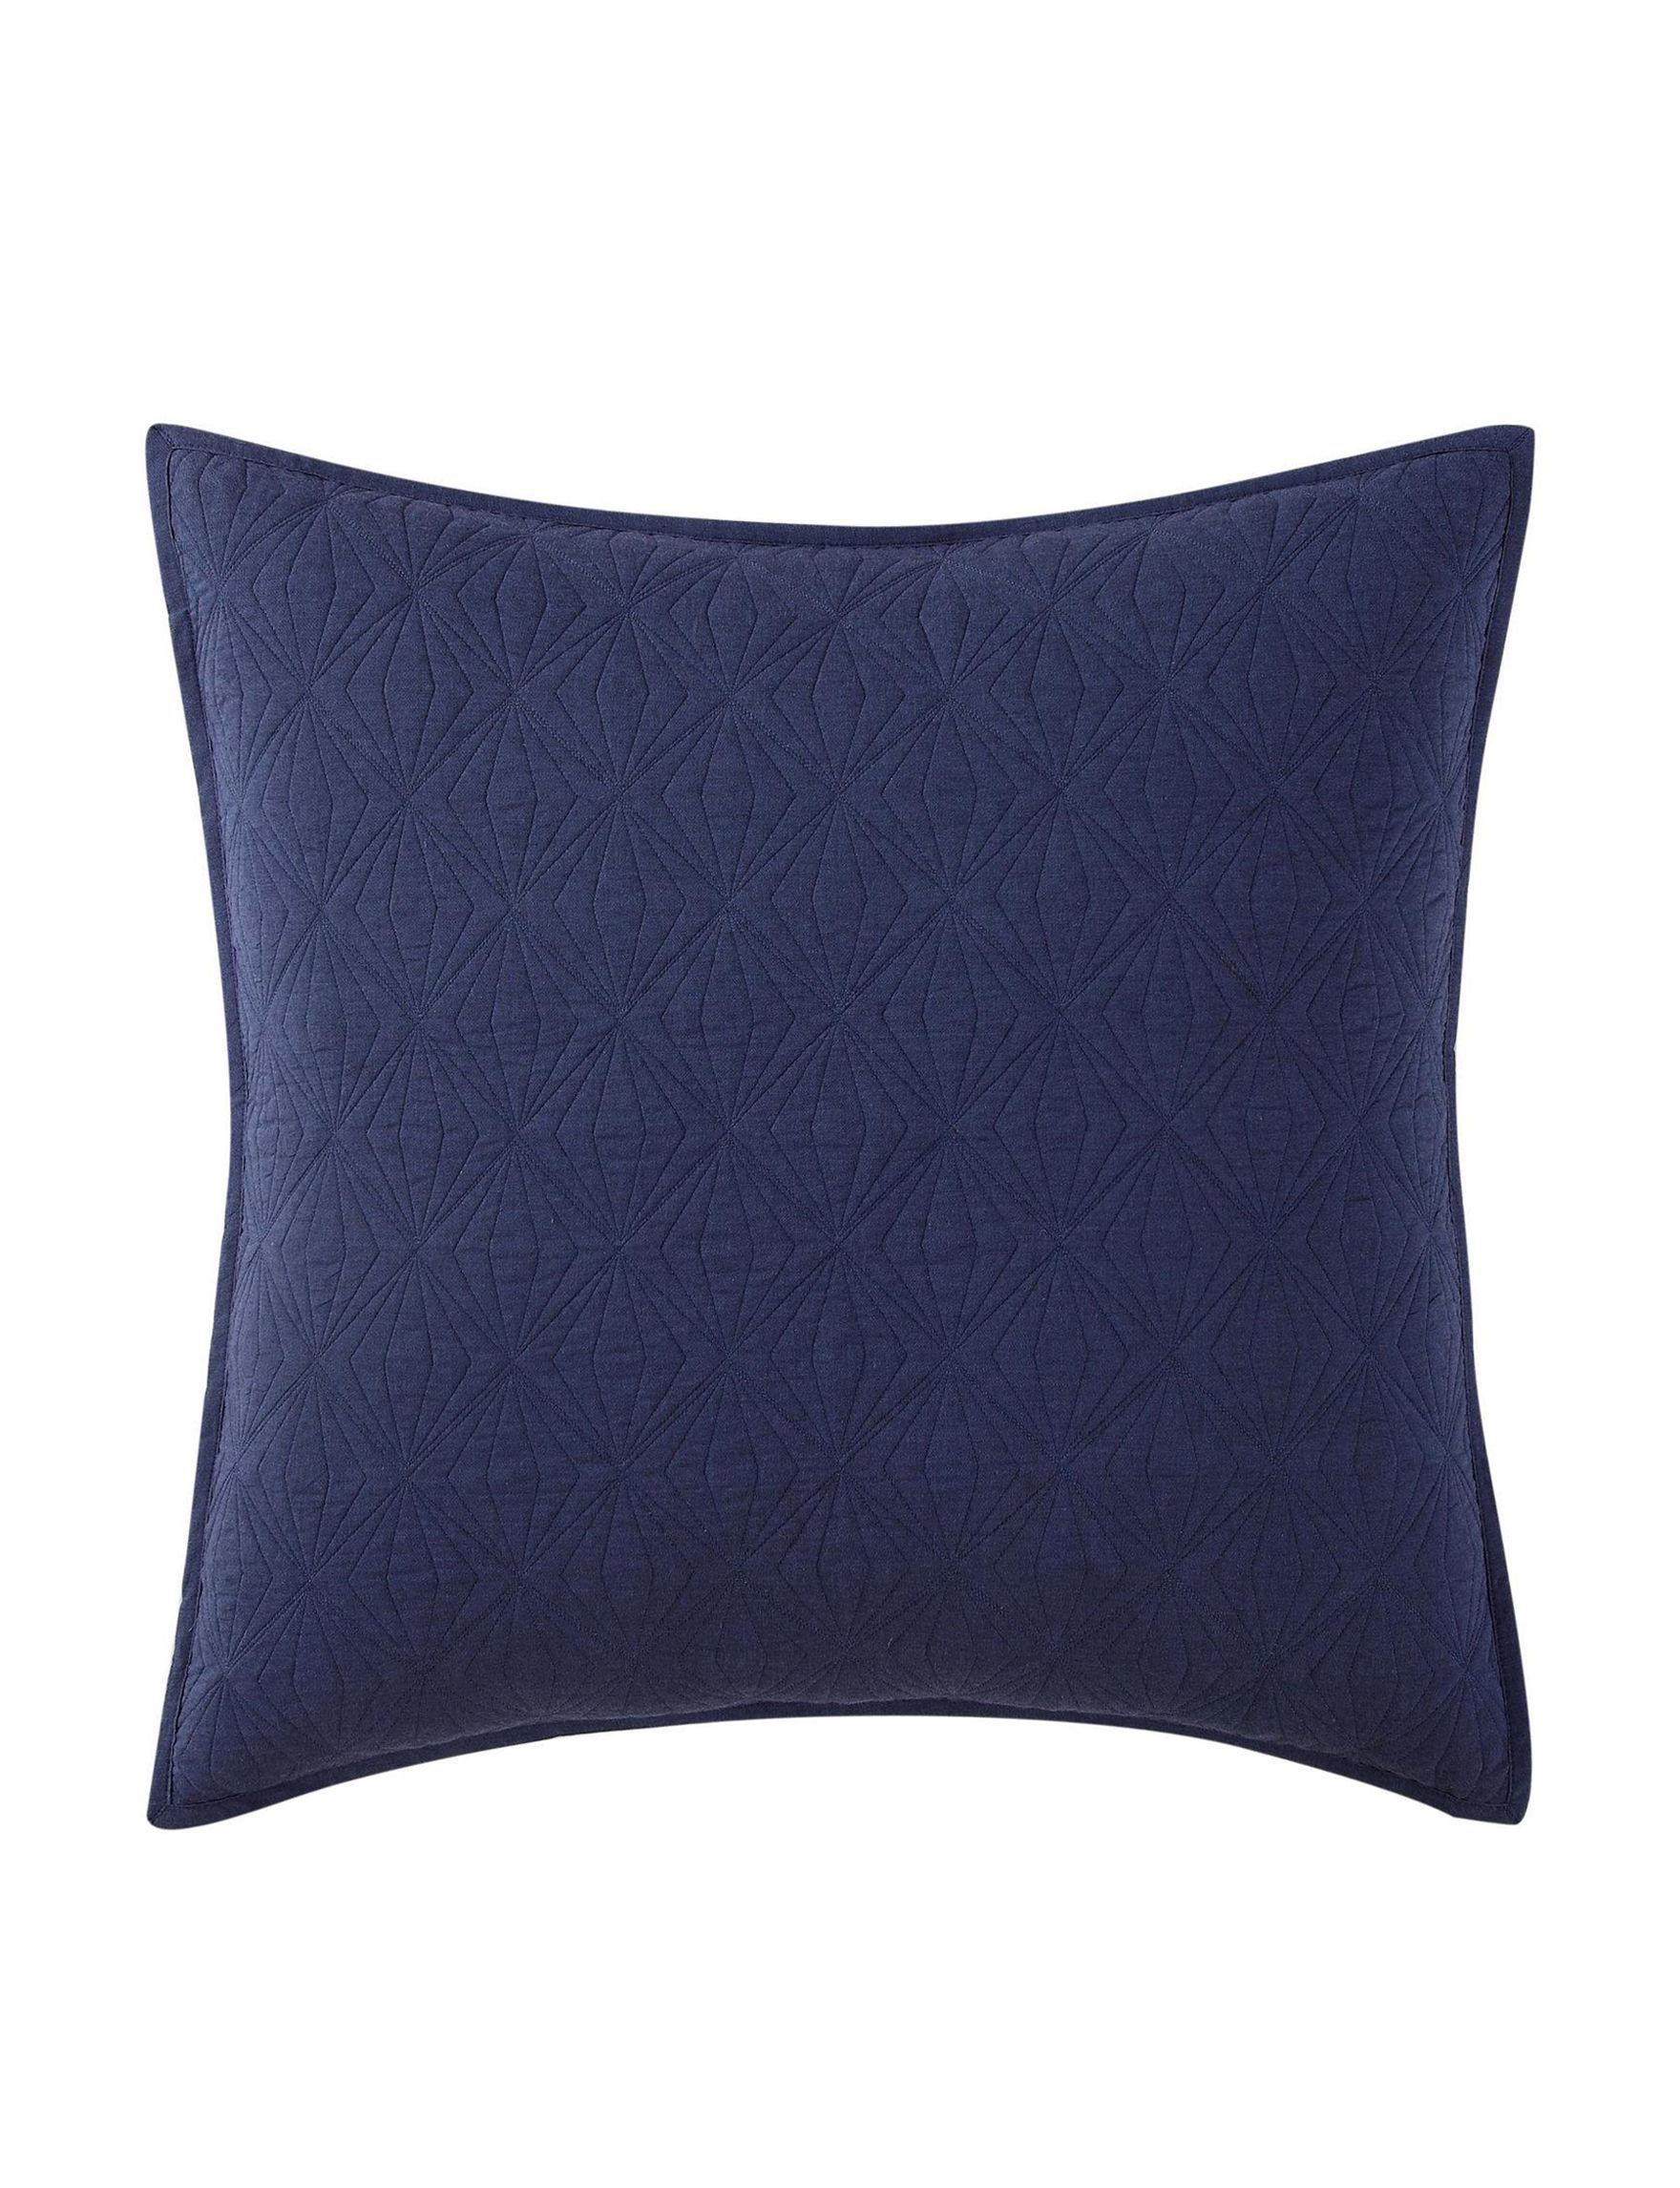 Tracy Porter Blue Pillow Shams